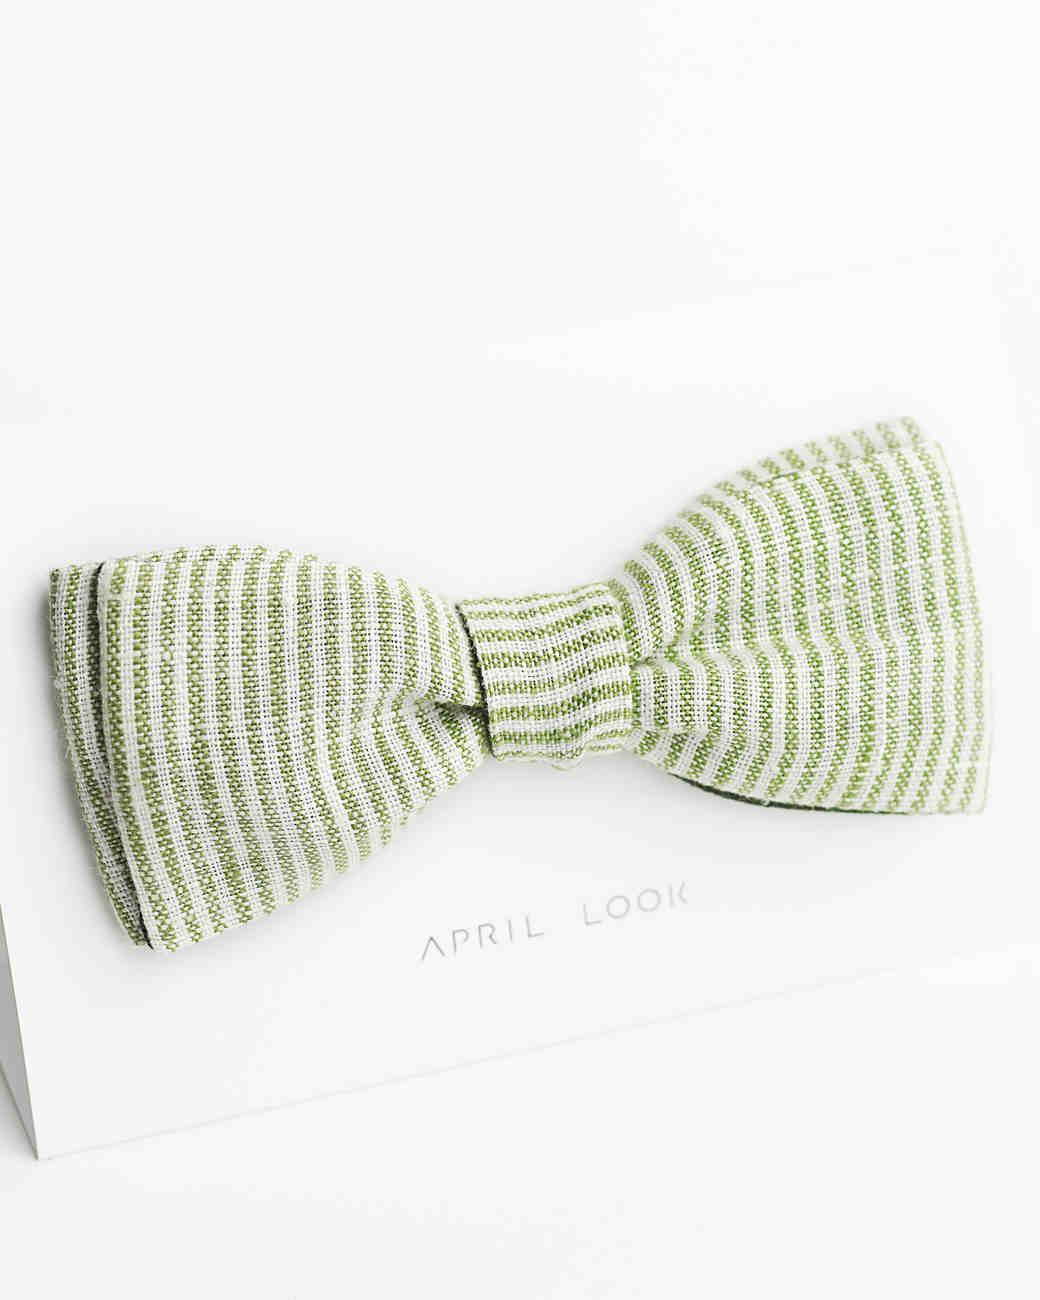 bow-ties-april-look-green-stripes-0814.jpg